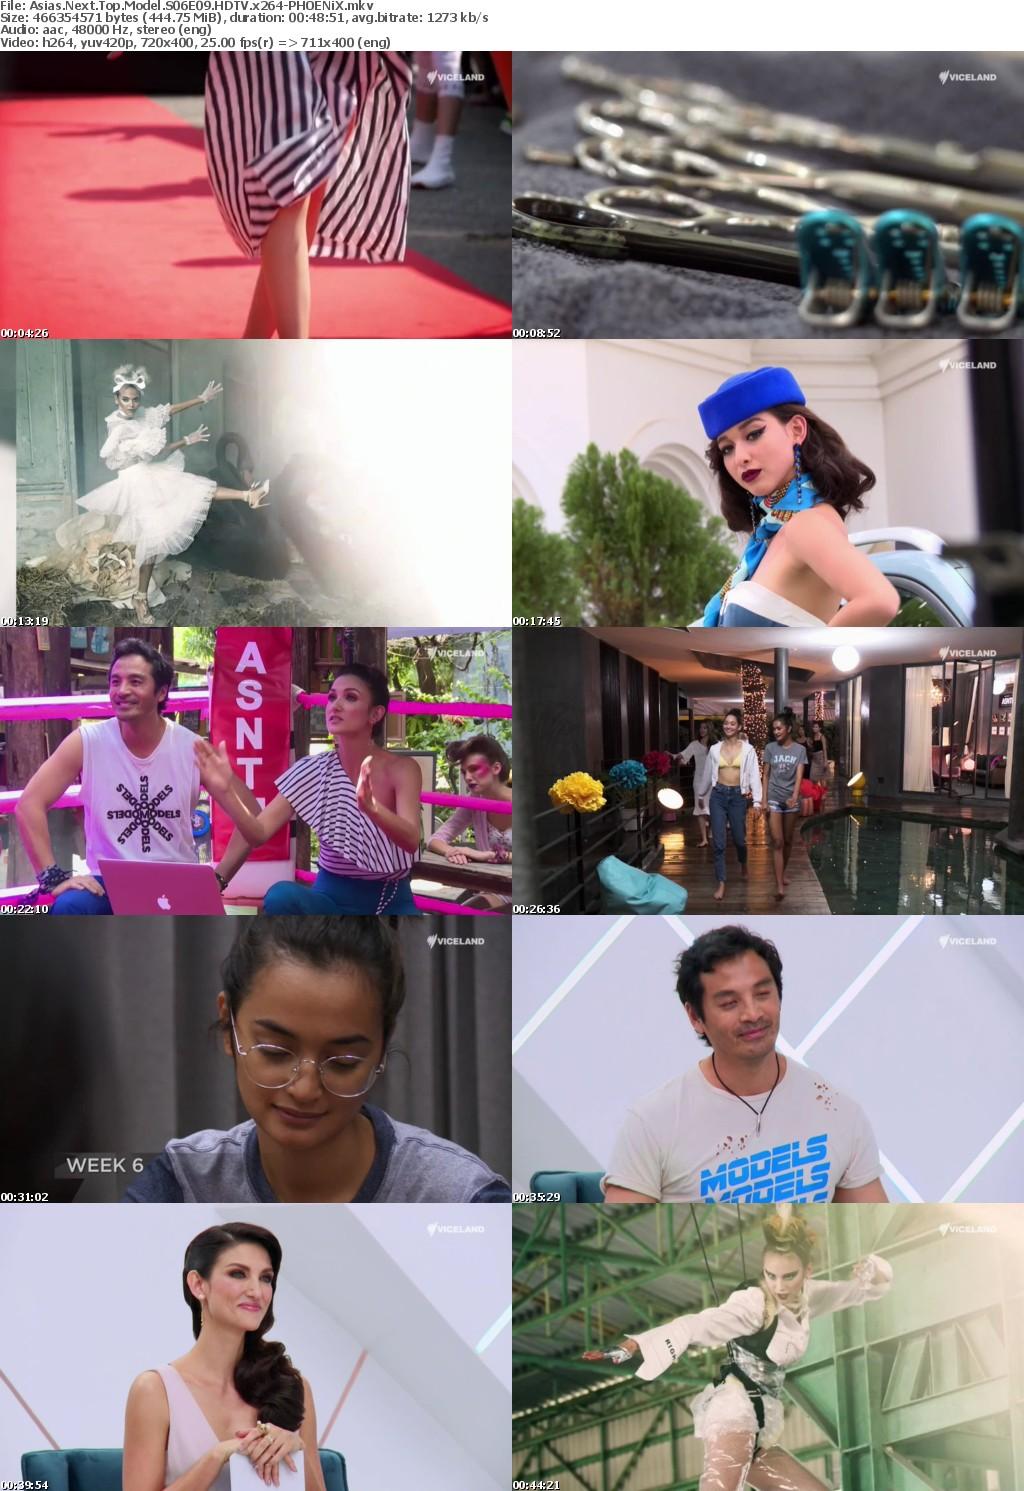 Asias Next Top Model S06E09 HDTV x264-PHOENiX